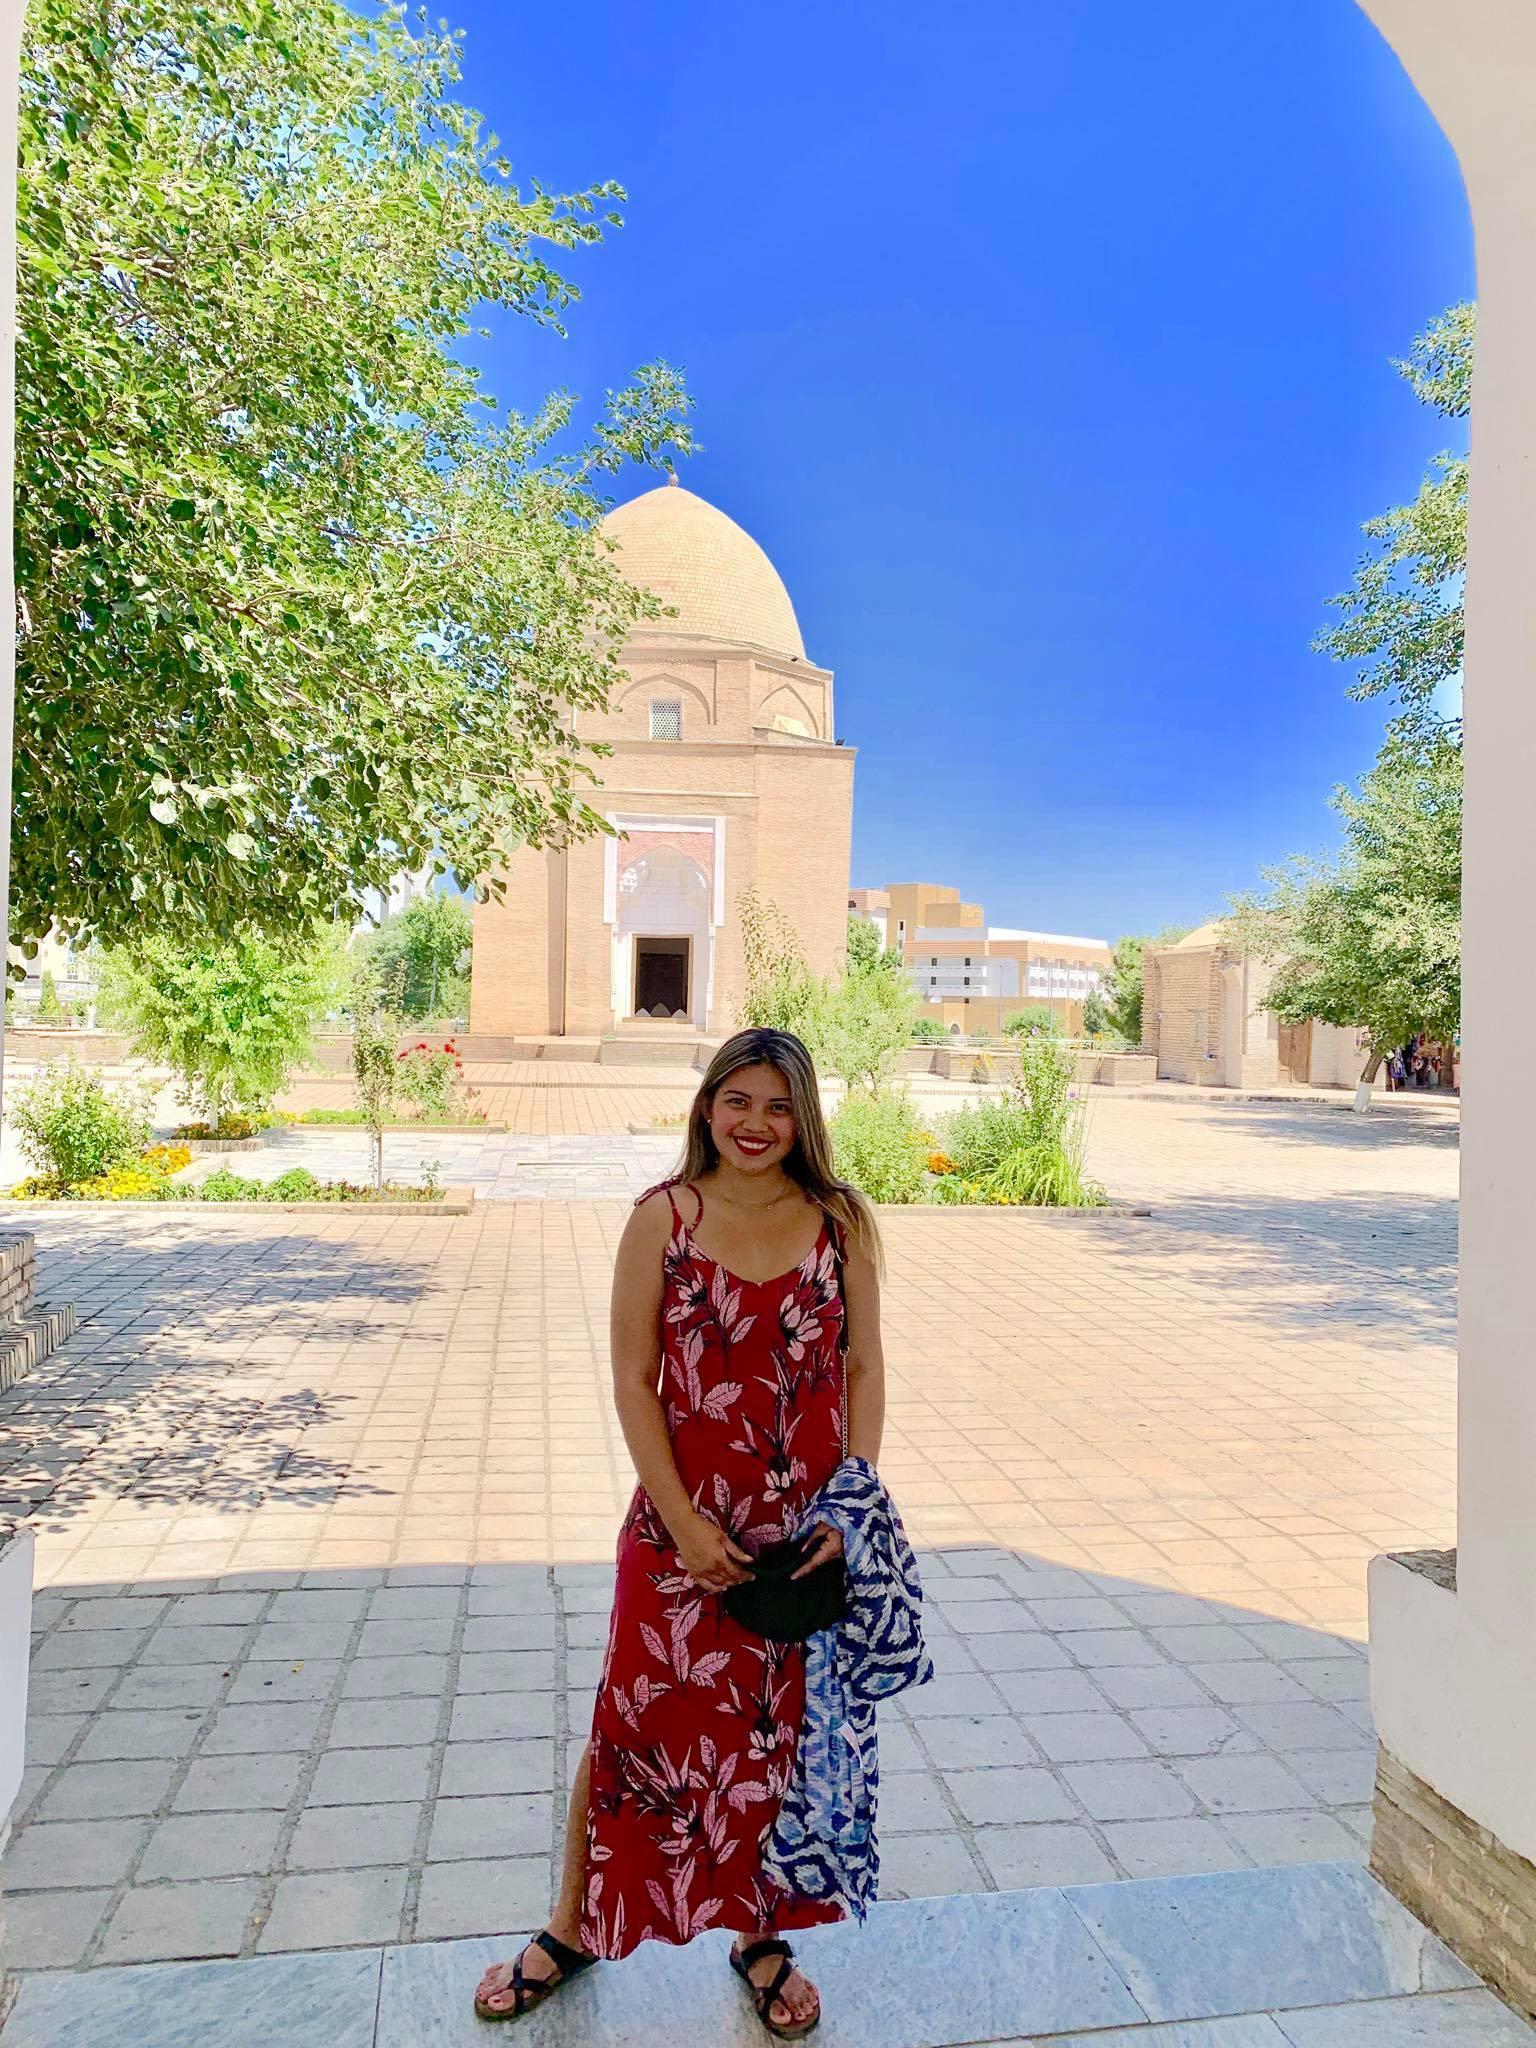 Things To Do in Uzbekistan2